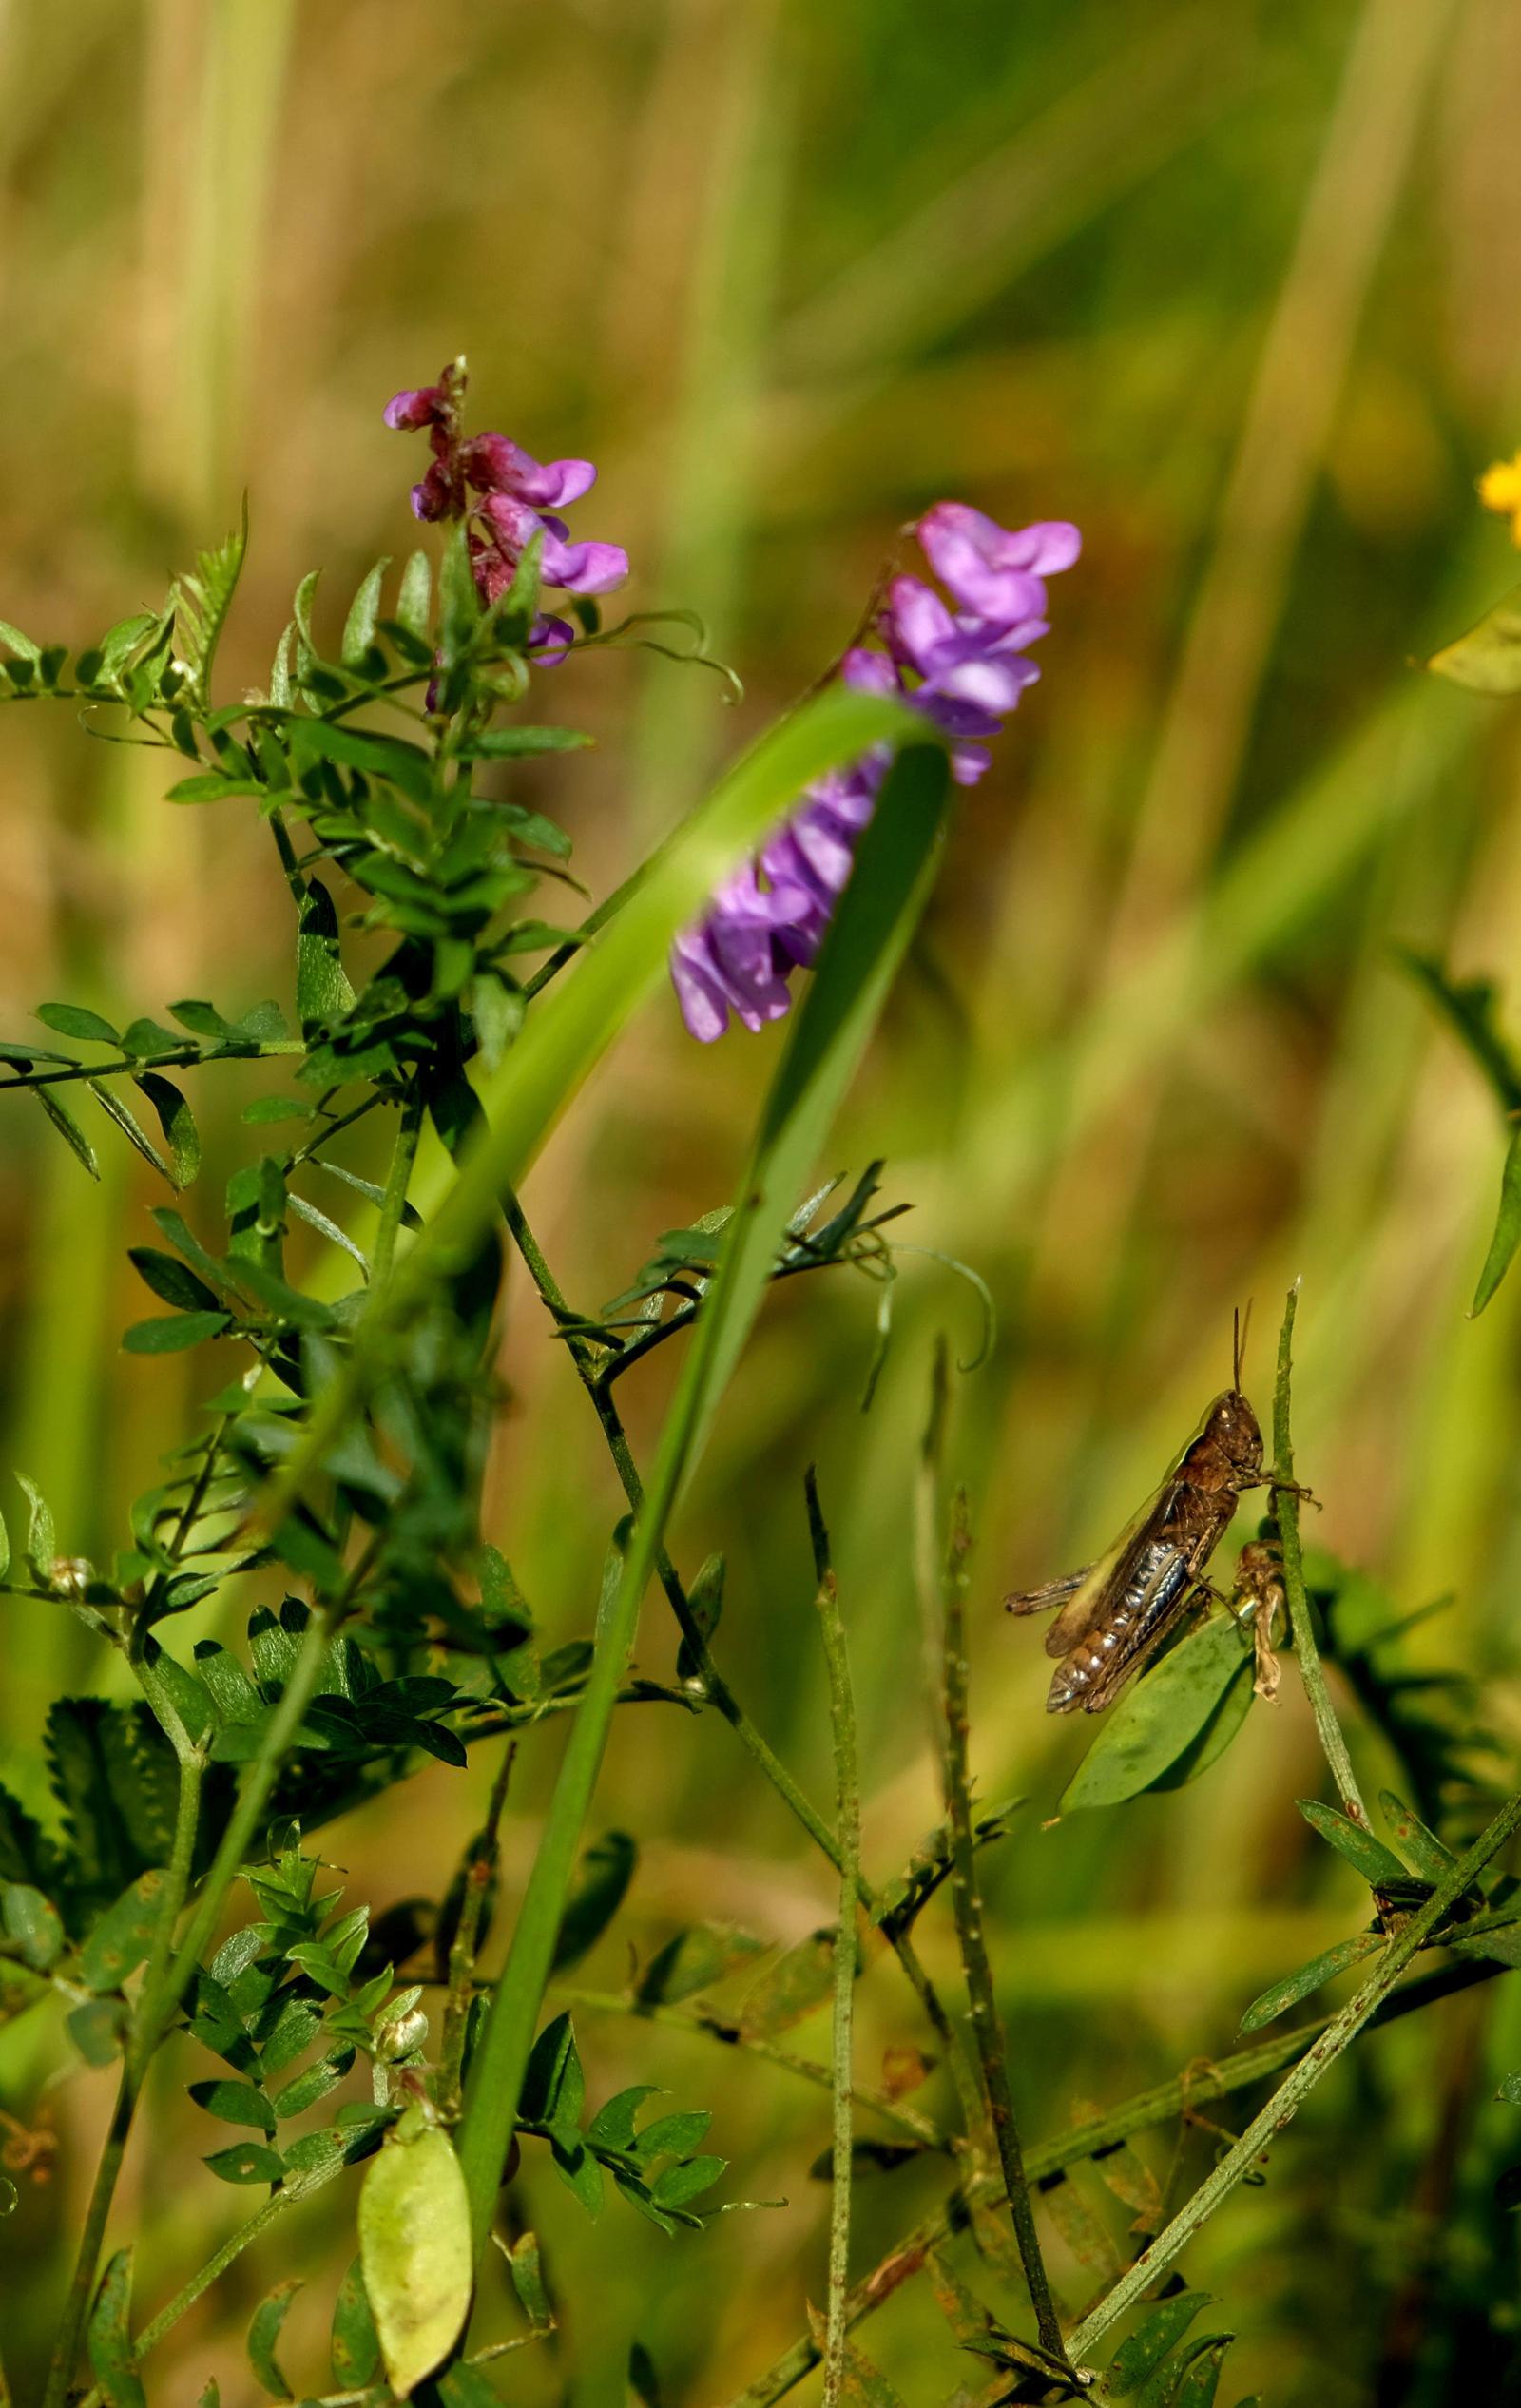 Grasshopper by LoveForDetails